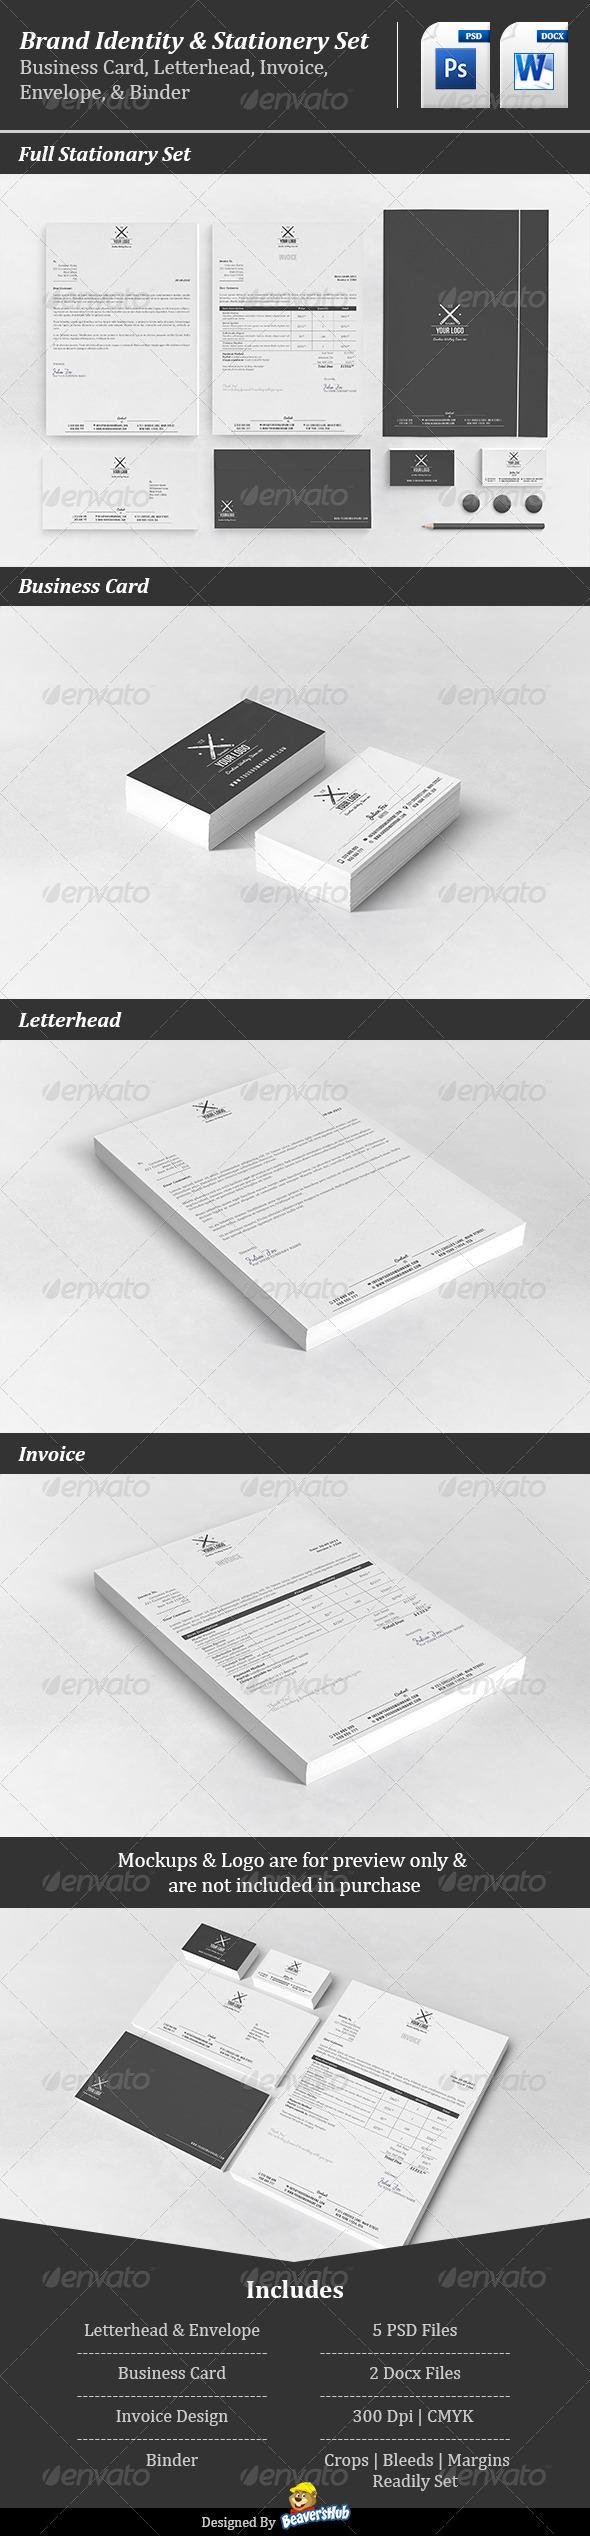 Corporate Stationery Set - Stationery Print Templates